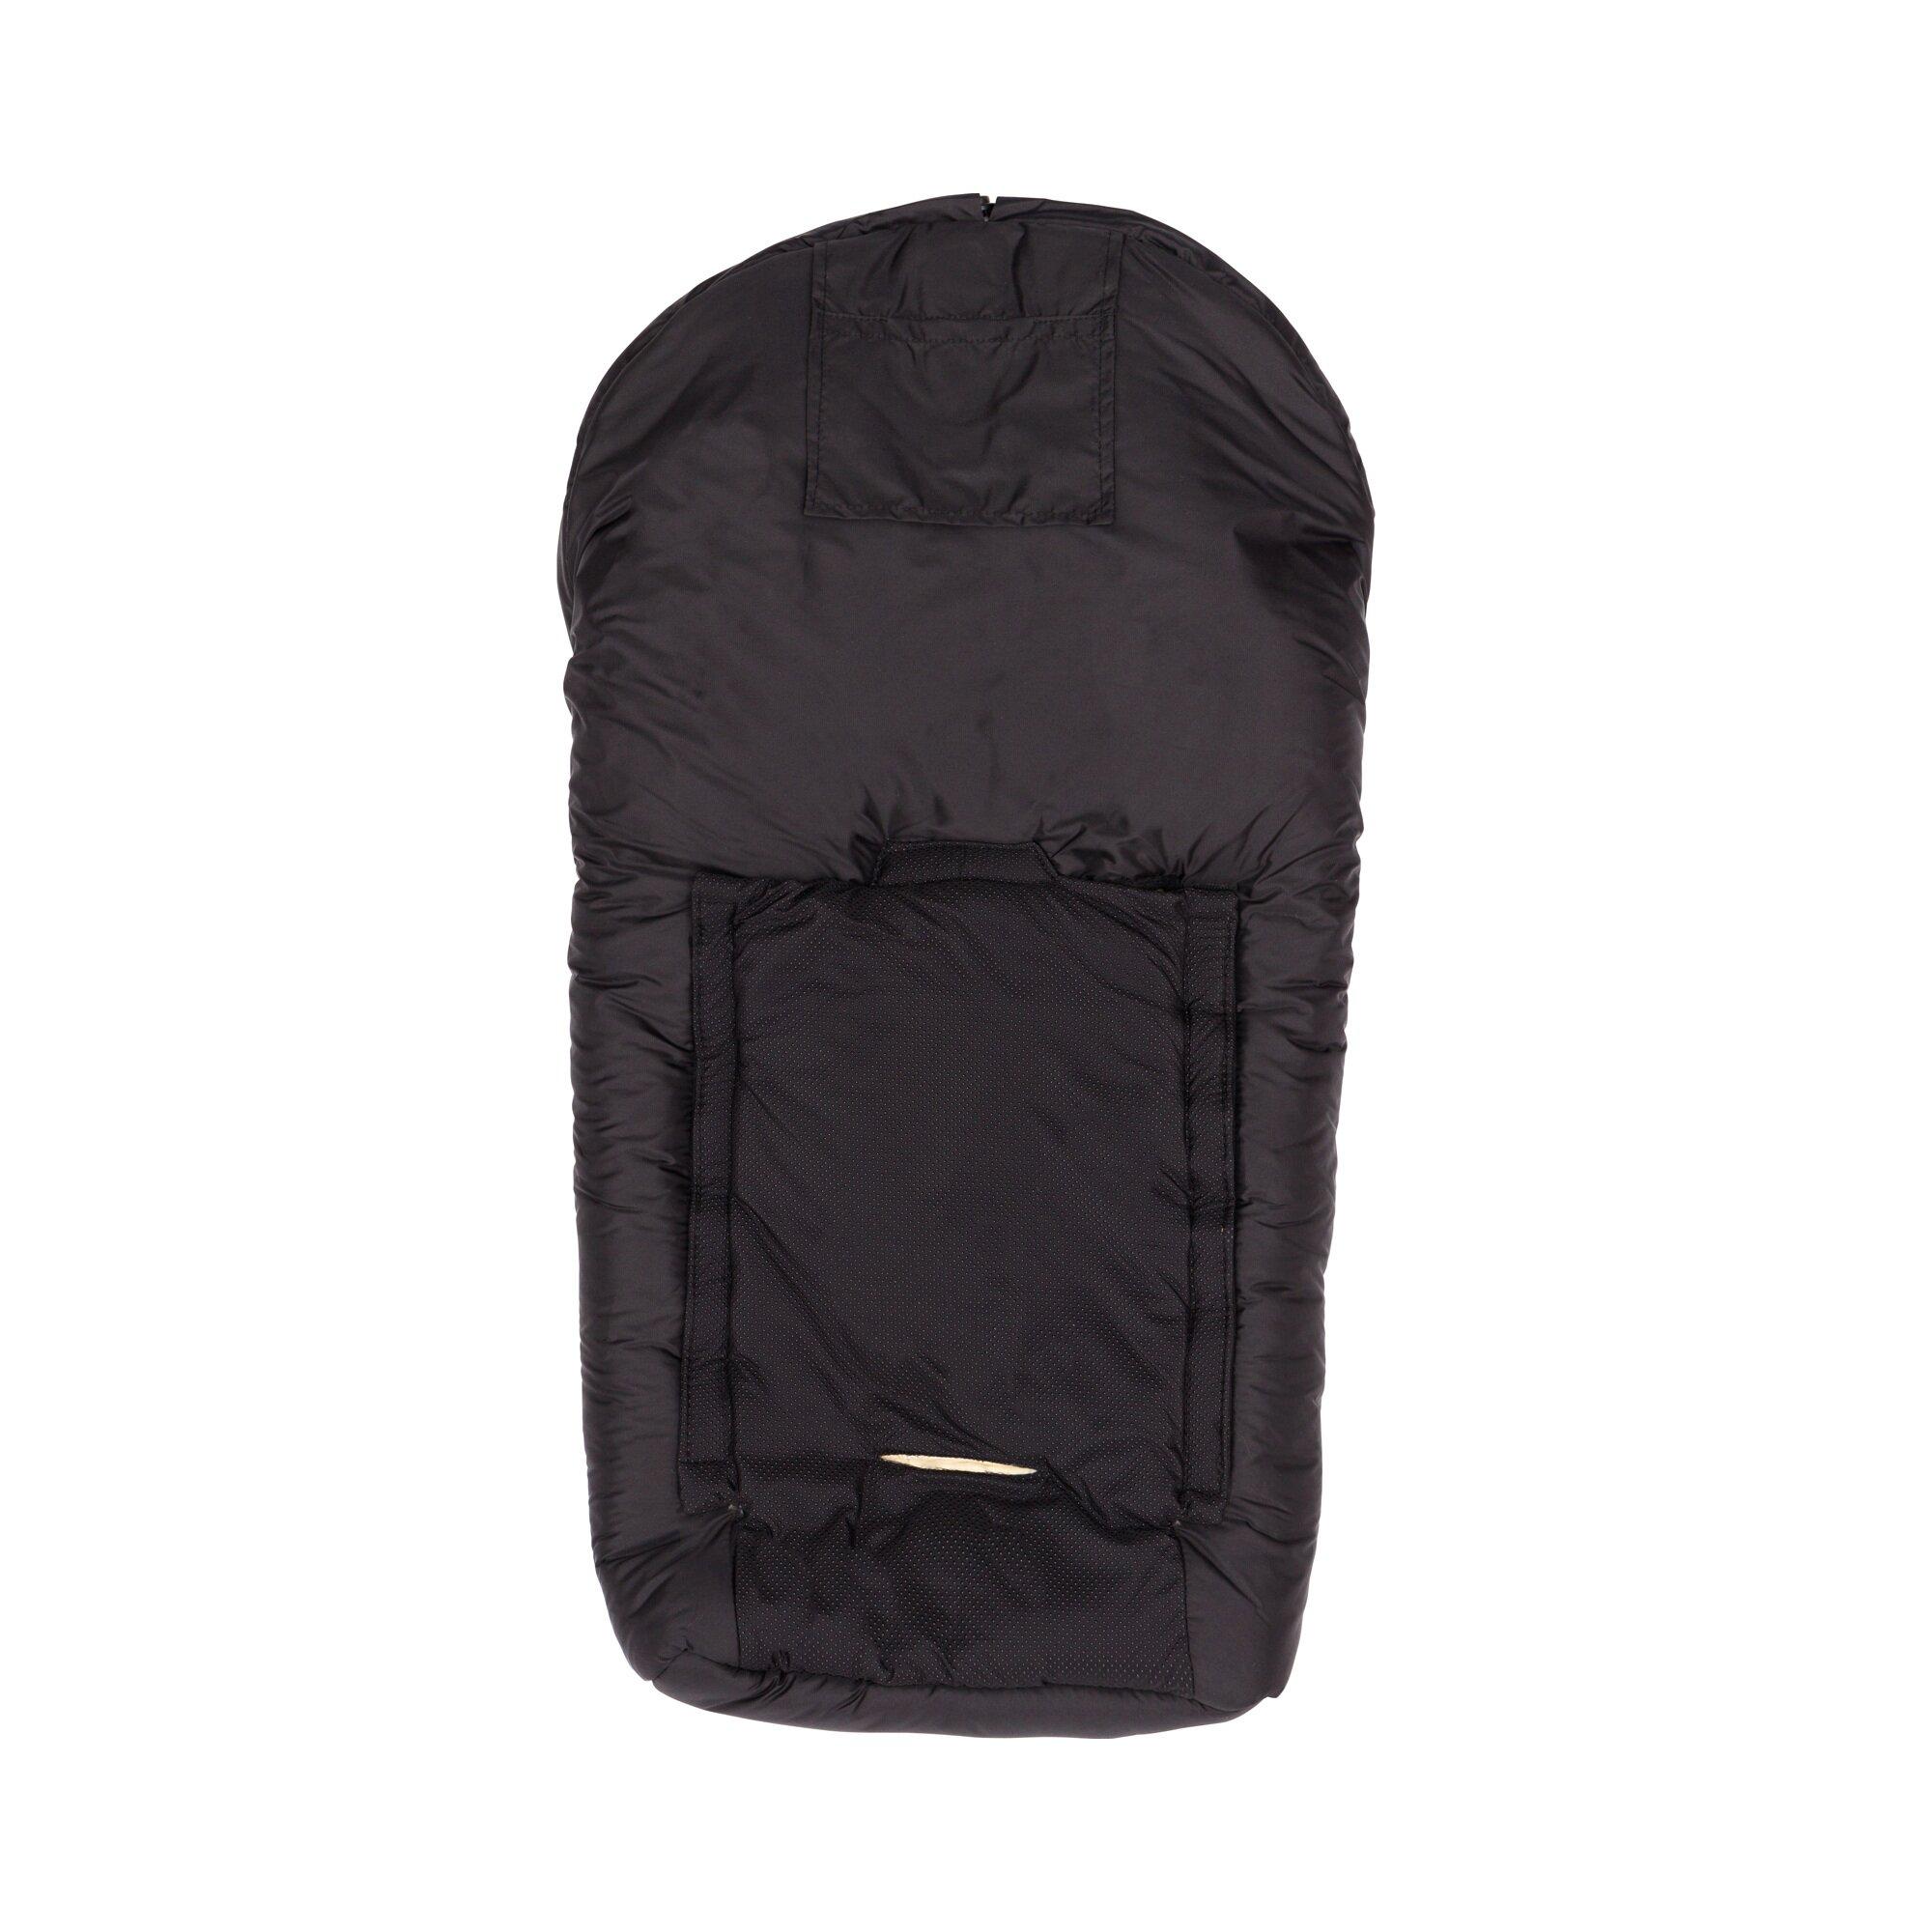 babycab-lammfell-fu-sack-elbrus-fur-babyschale-kinderwagen-tragewanne-schwarz, 79.99 EUR @ babywalz-de